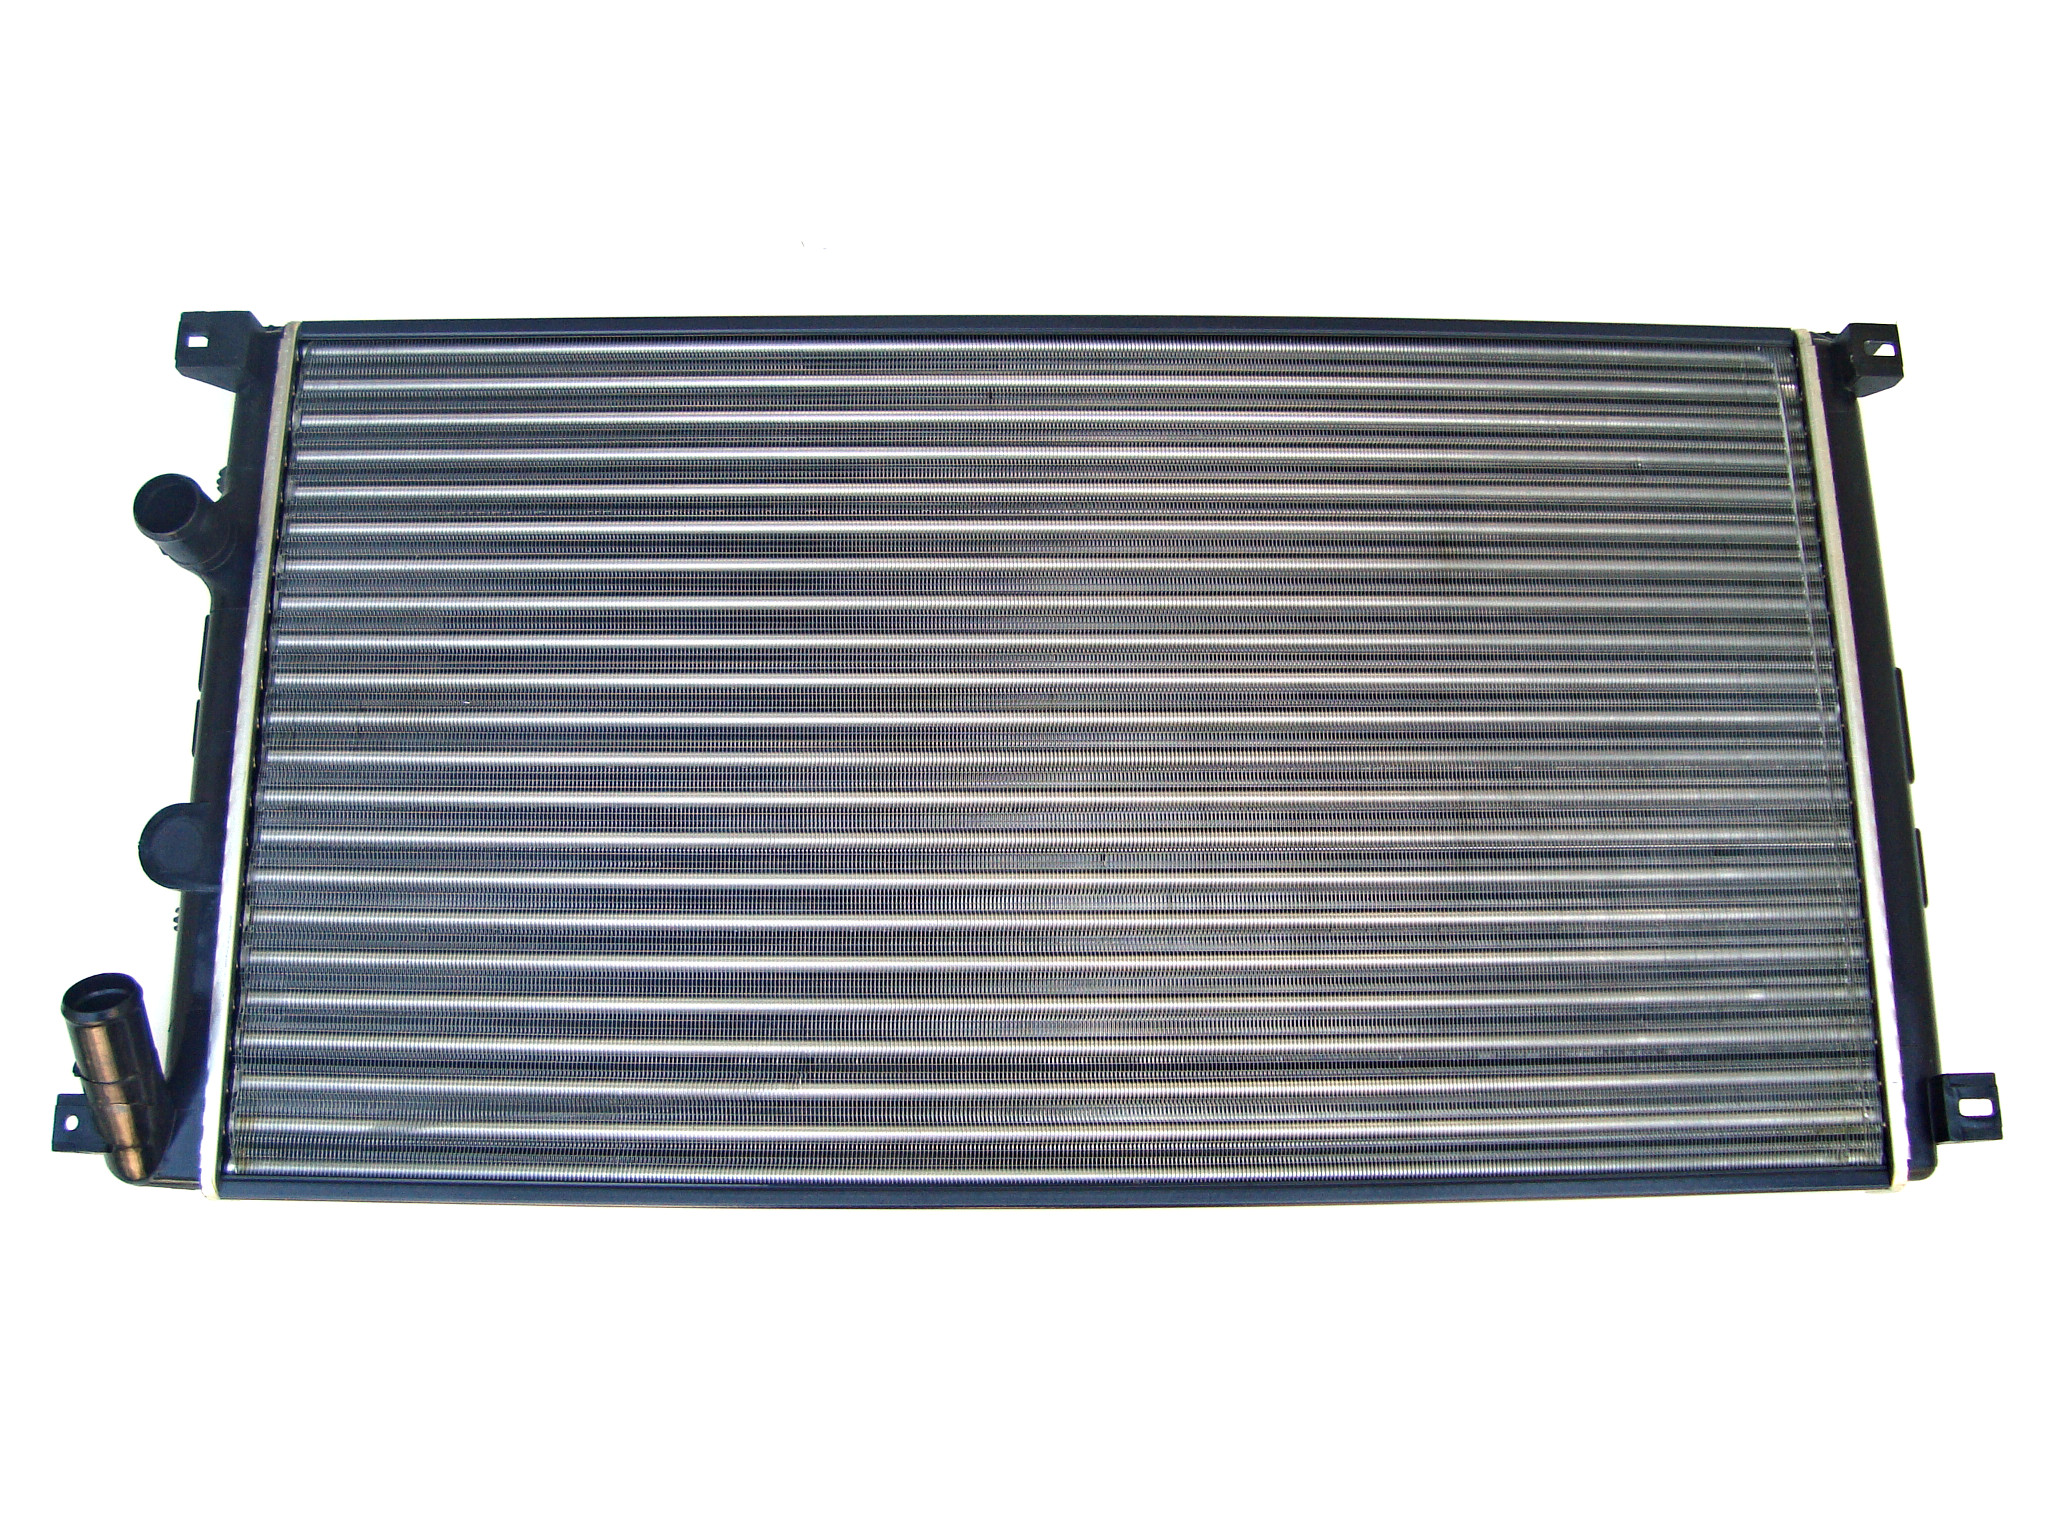 радиатор воды opel movano 19 22 25 30 dti